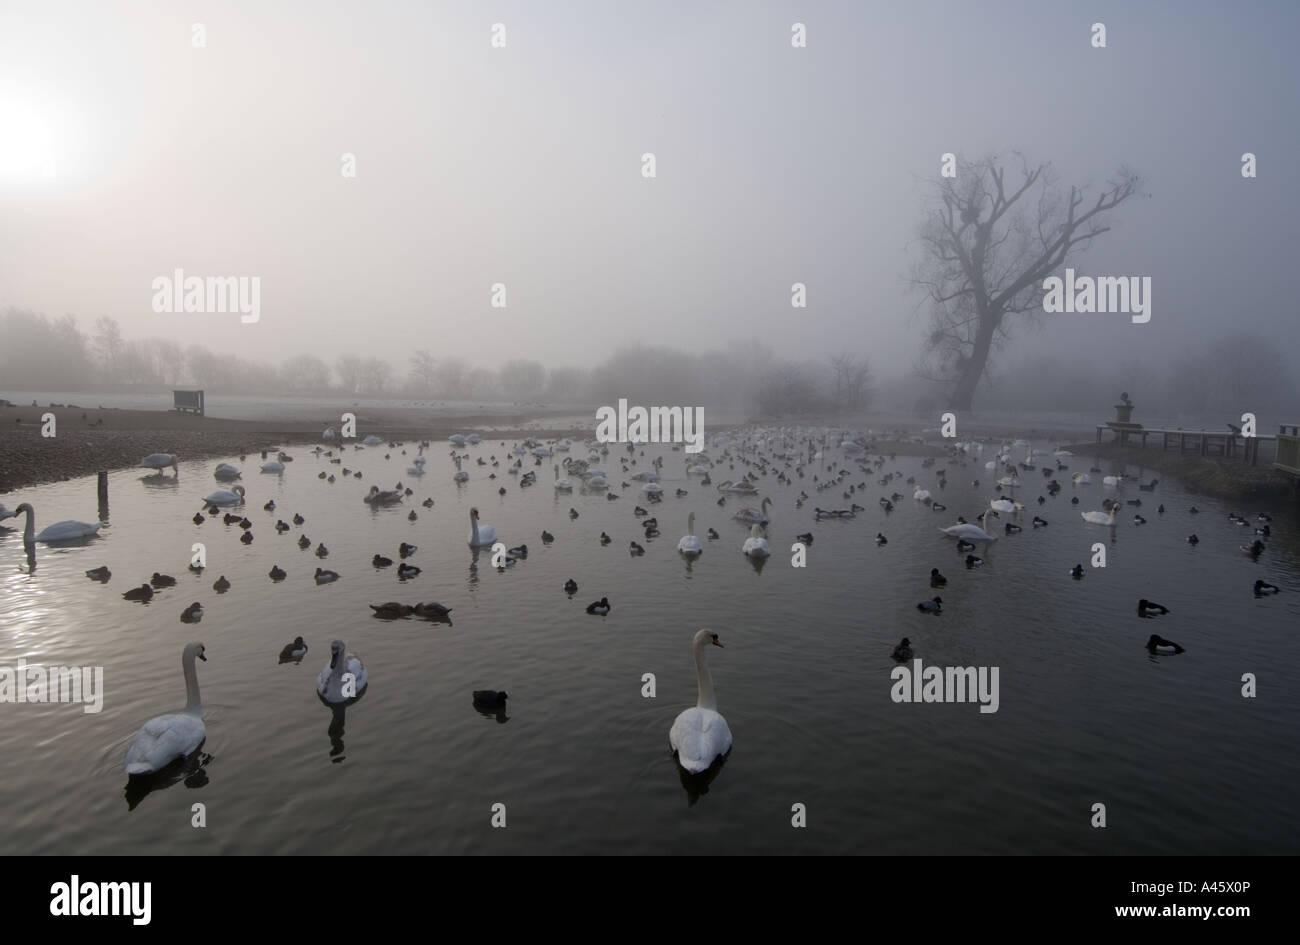 Wildfowl Wetlands Trust bird reserve Slimbridge - Gloucestershire - UK - Stock Image